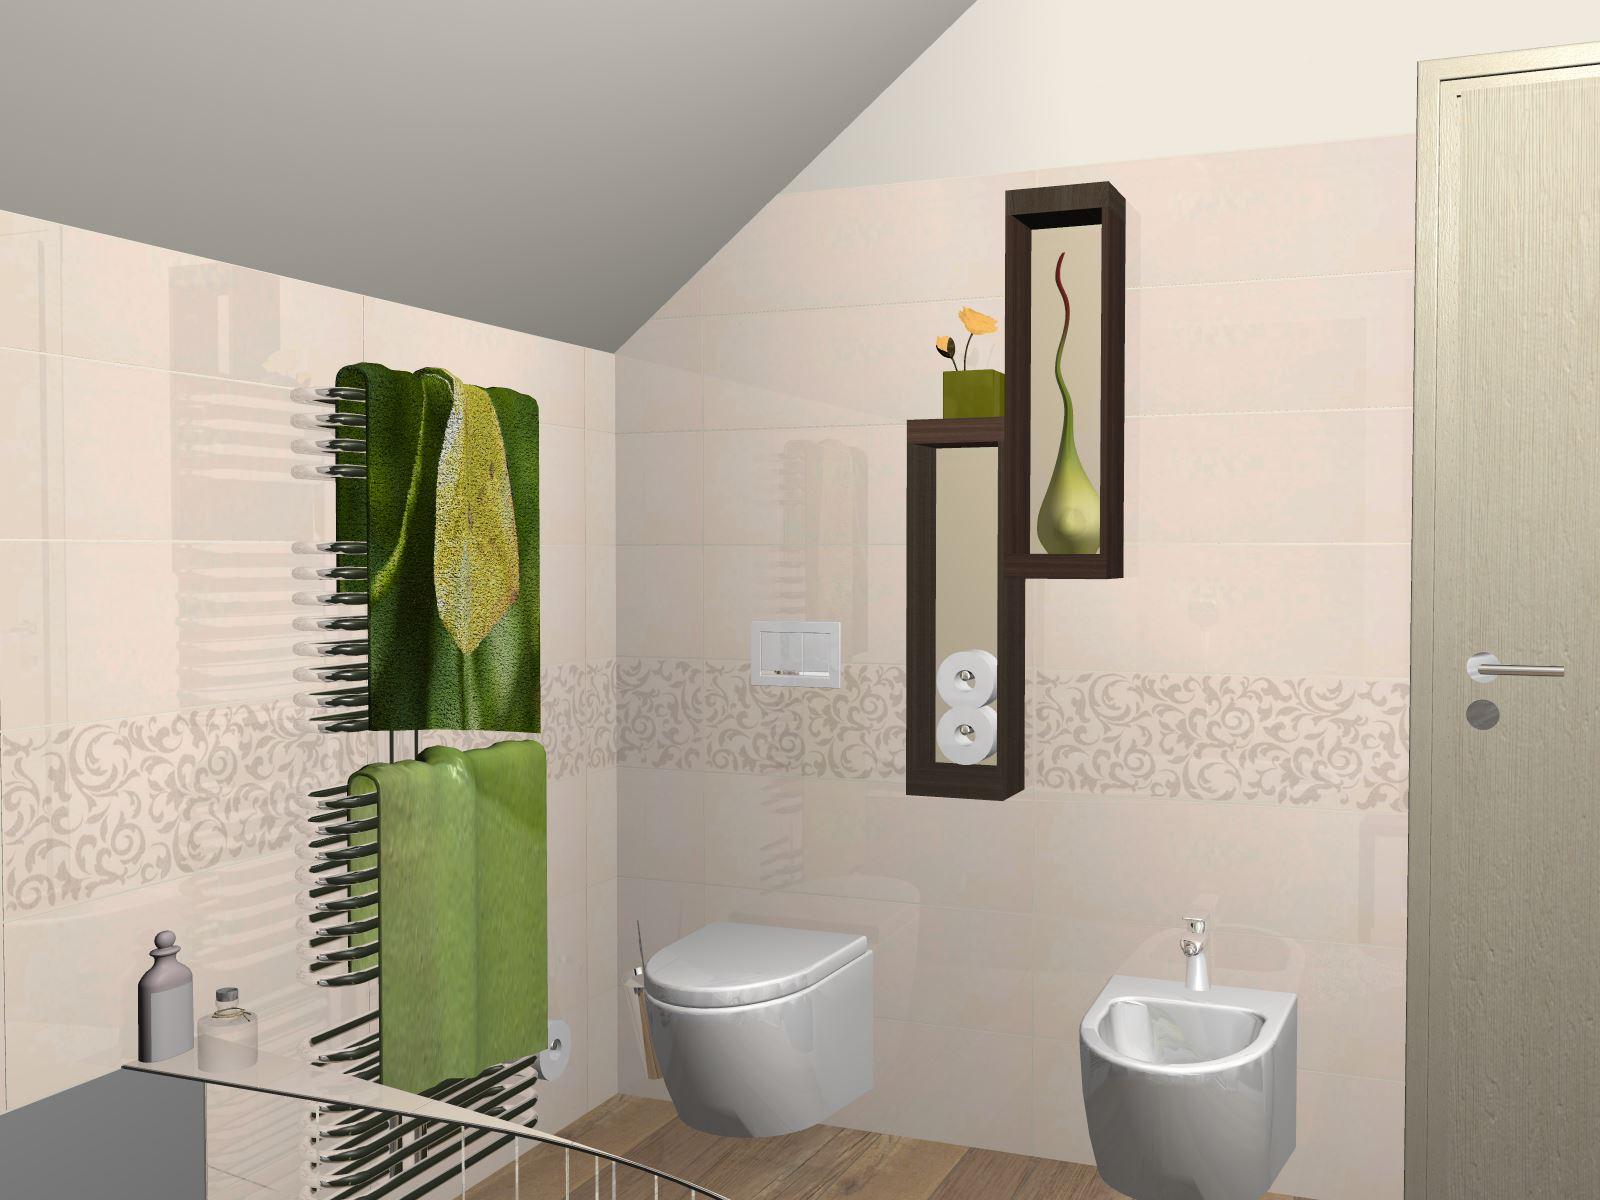 supergres malody bathroom by pirman romana trgocev d o o on visoft360 portal. Black Bedroom Furniture Sets. Home Design Ideas